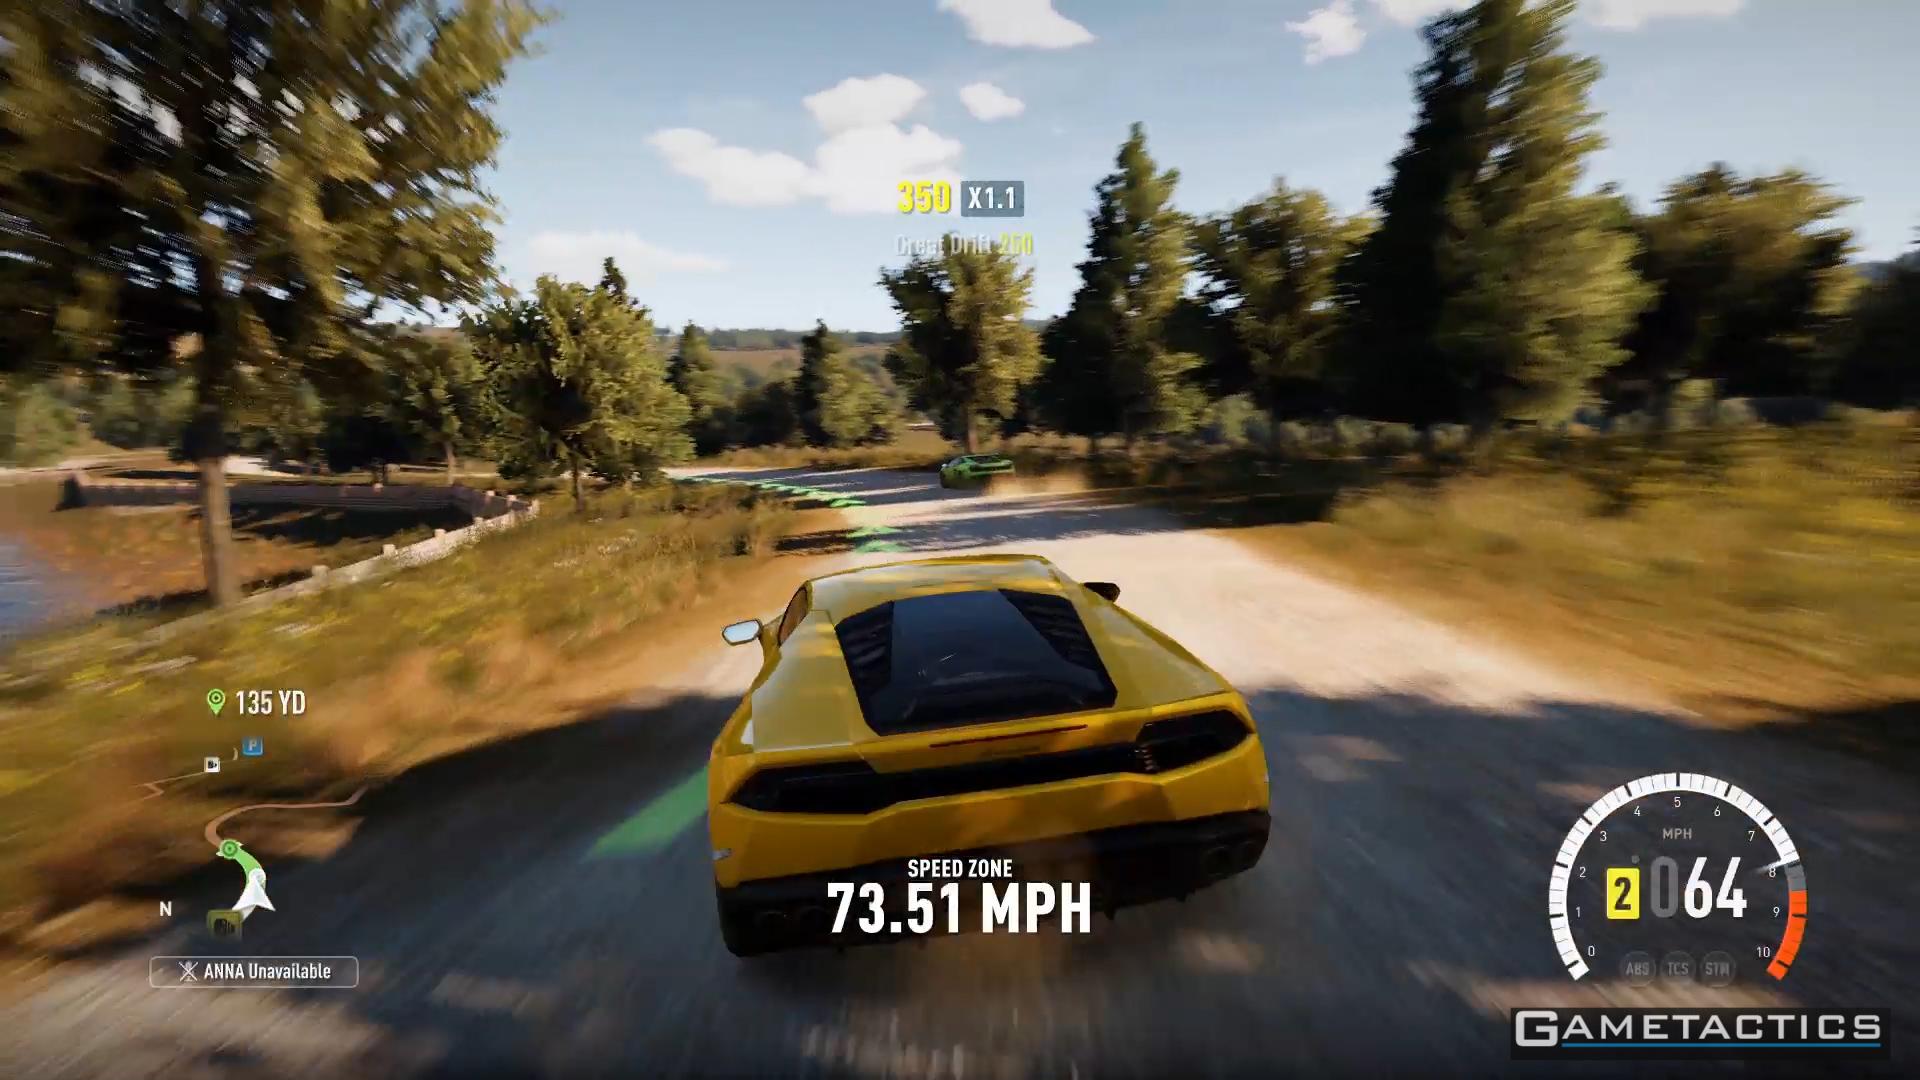 Forza-Horizon-2-Screenshot-2 – Michael Clarke Games